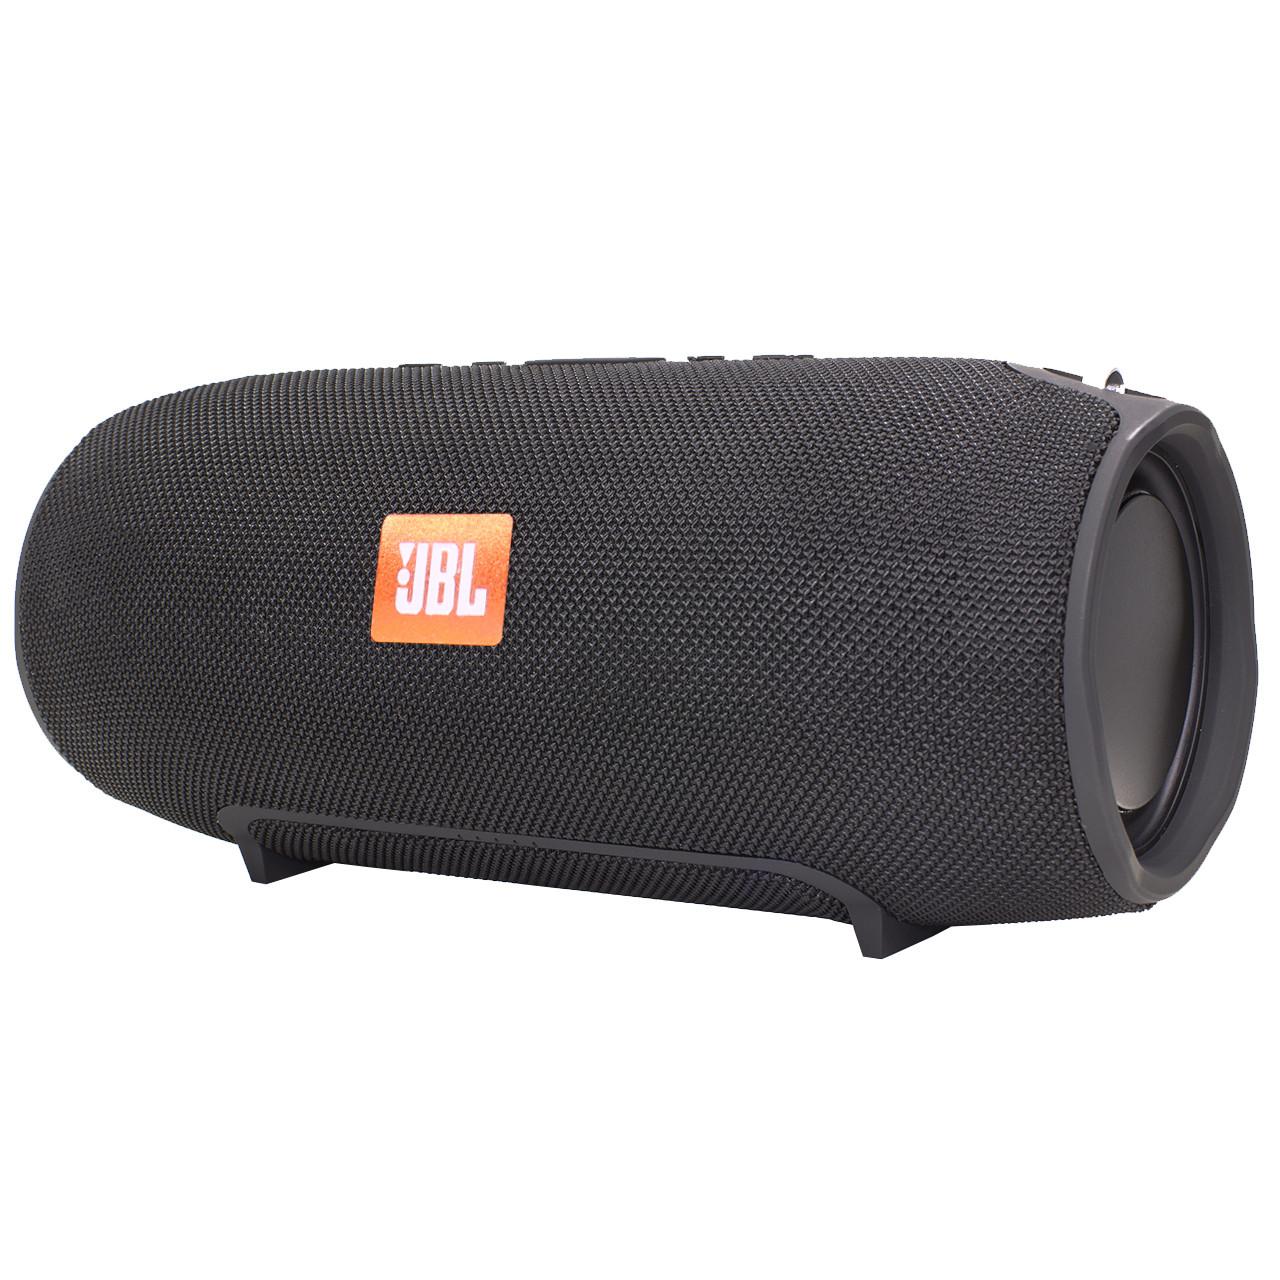 ☇Переносная колонка BL JBL Xtreme Black Bluetooth FM USB microUSB портативная беспроводная